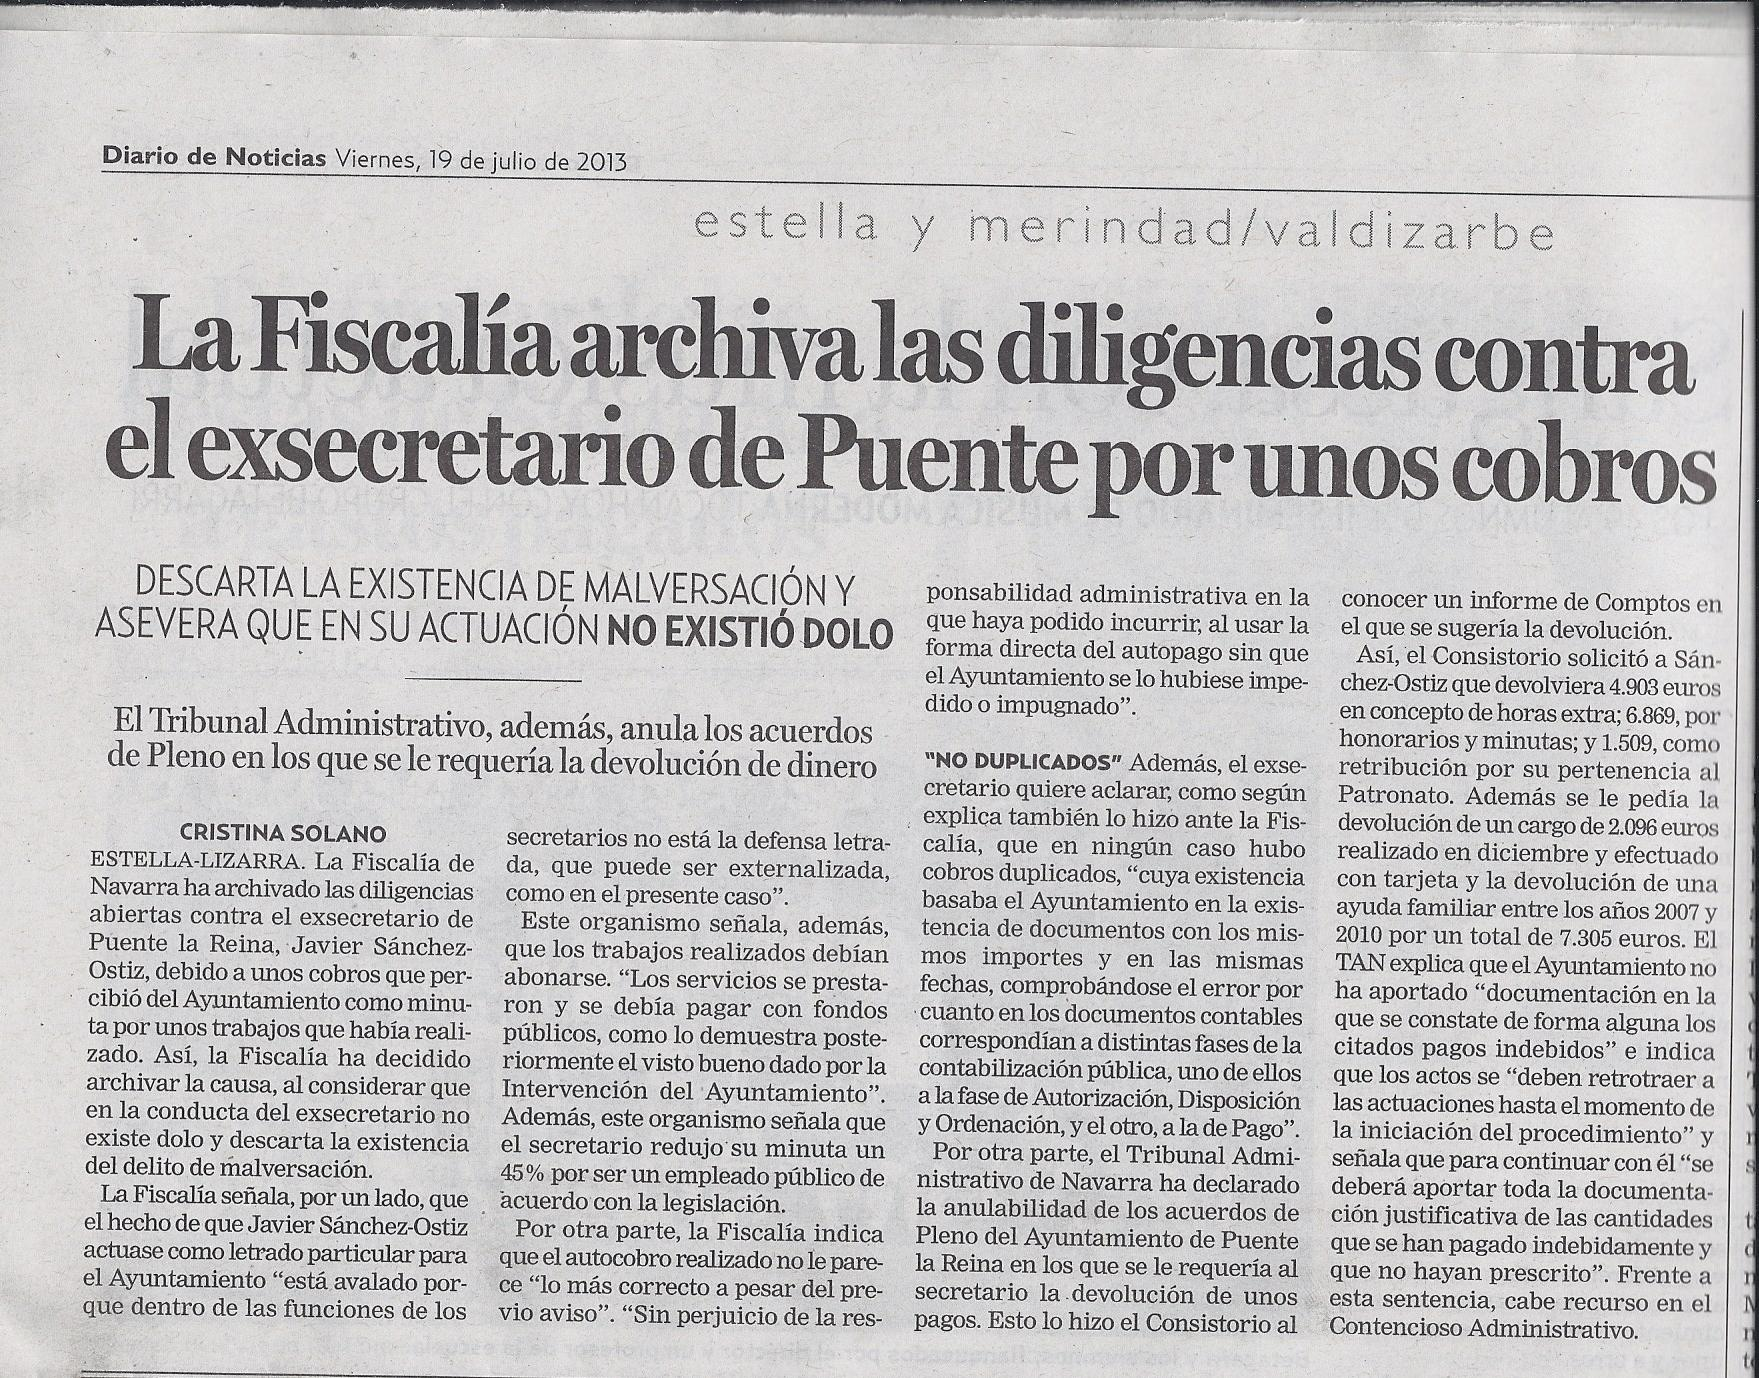 Diario de Noticias 19.07.2013 - Horizontal